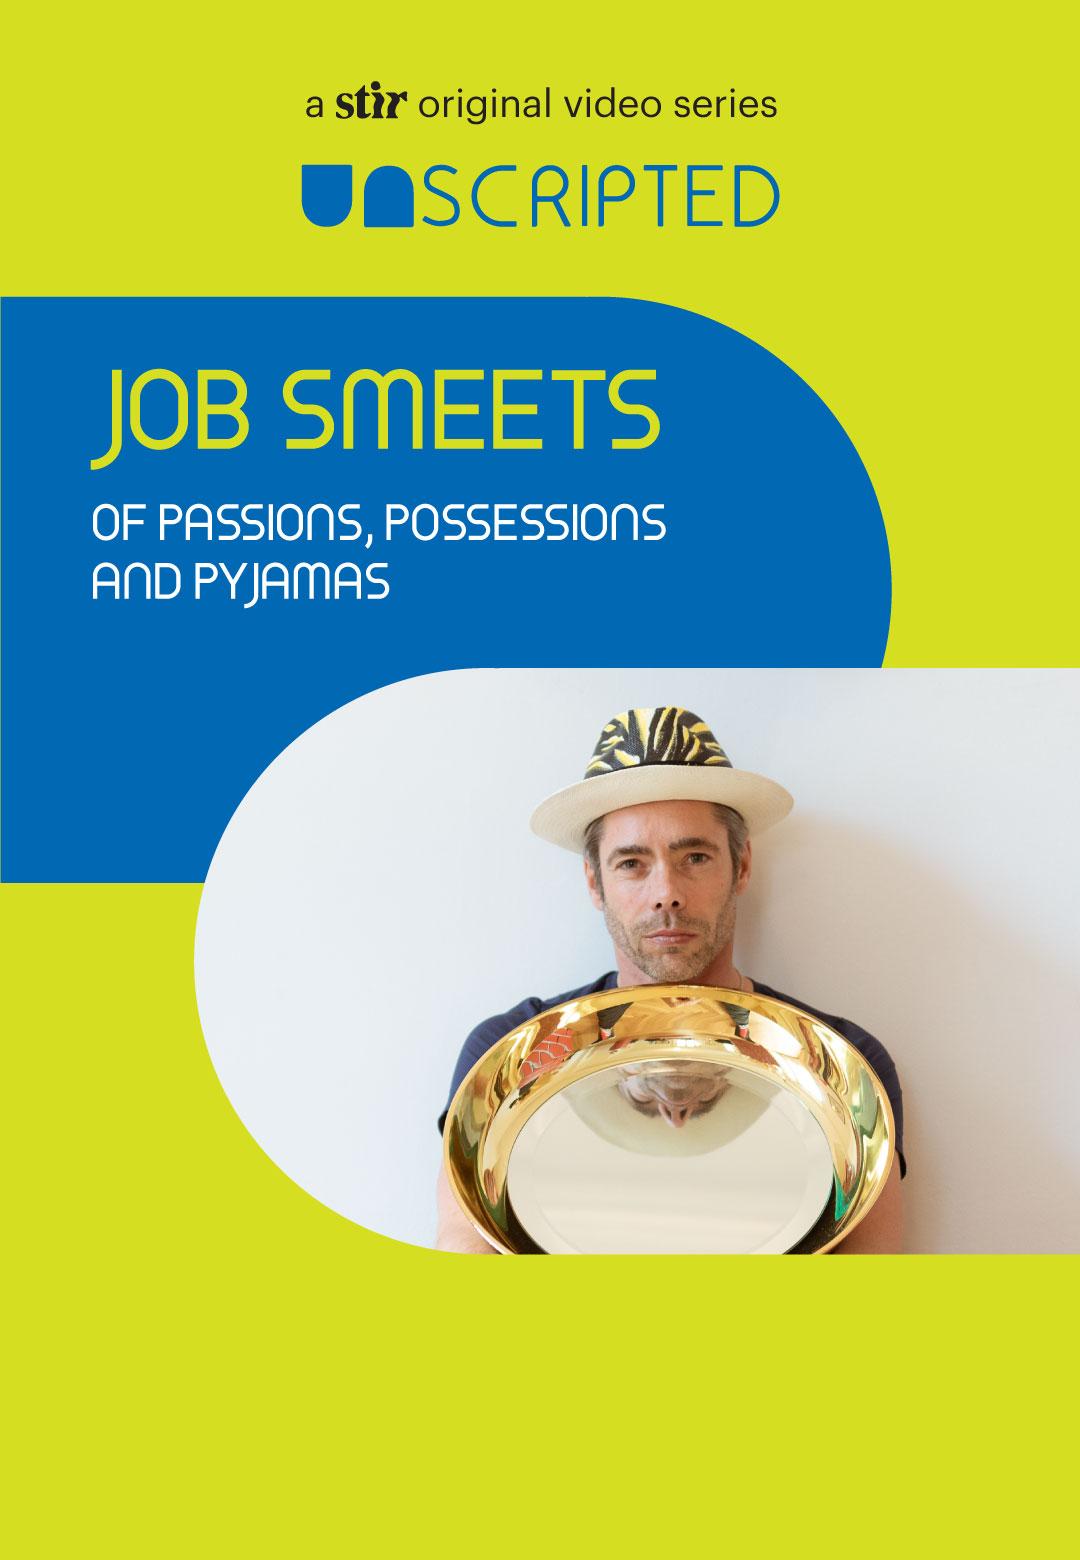 UNSCRIPTED with Job Smeets | Studio Job | The Netherlands | STIRworld